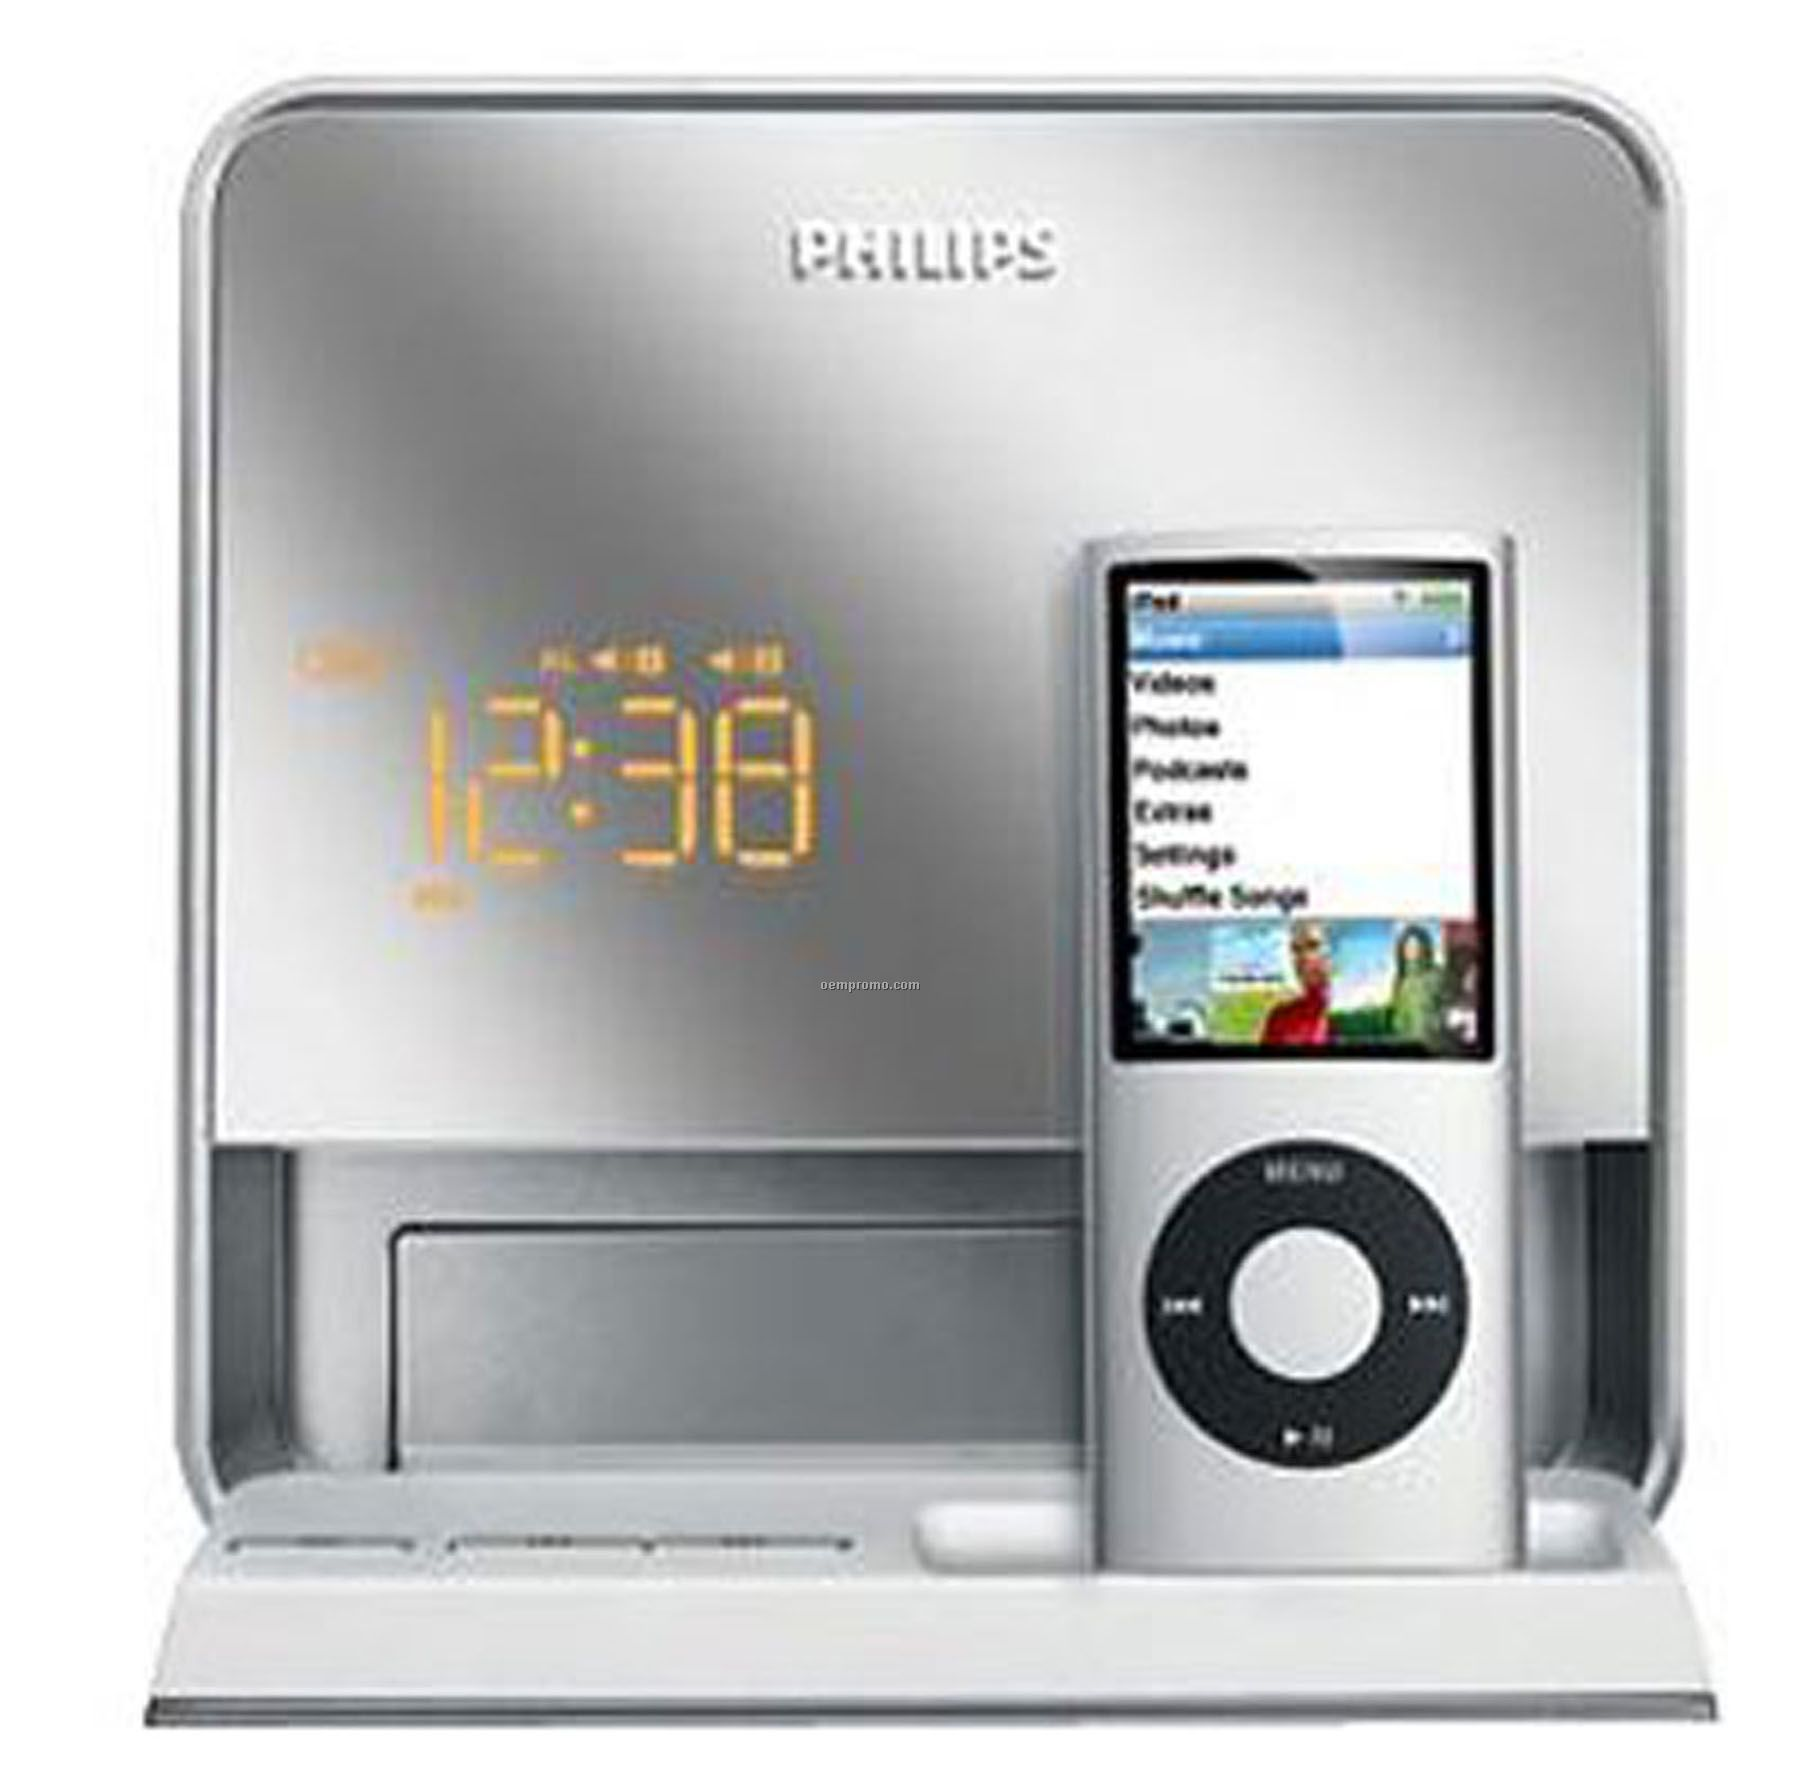 ... Dock Alarm Clock Speaker,China Wholesale Philips Dc19037 Ipod Dock: http://www.oempromo.com/product/Clocks/P/Philips-Dc19037-Ipod-Dock-Alarm-Clock-Speaker-136168.htm